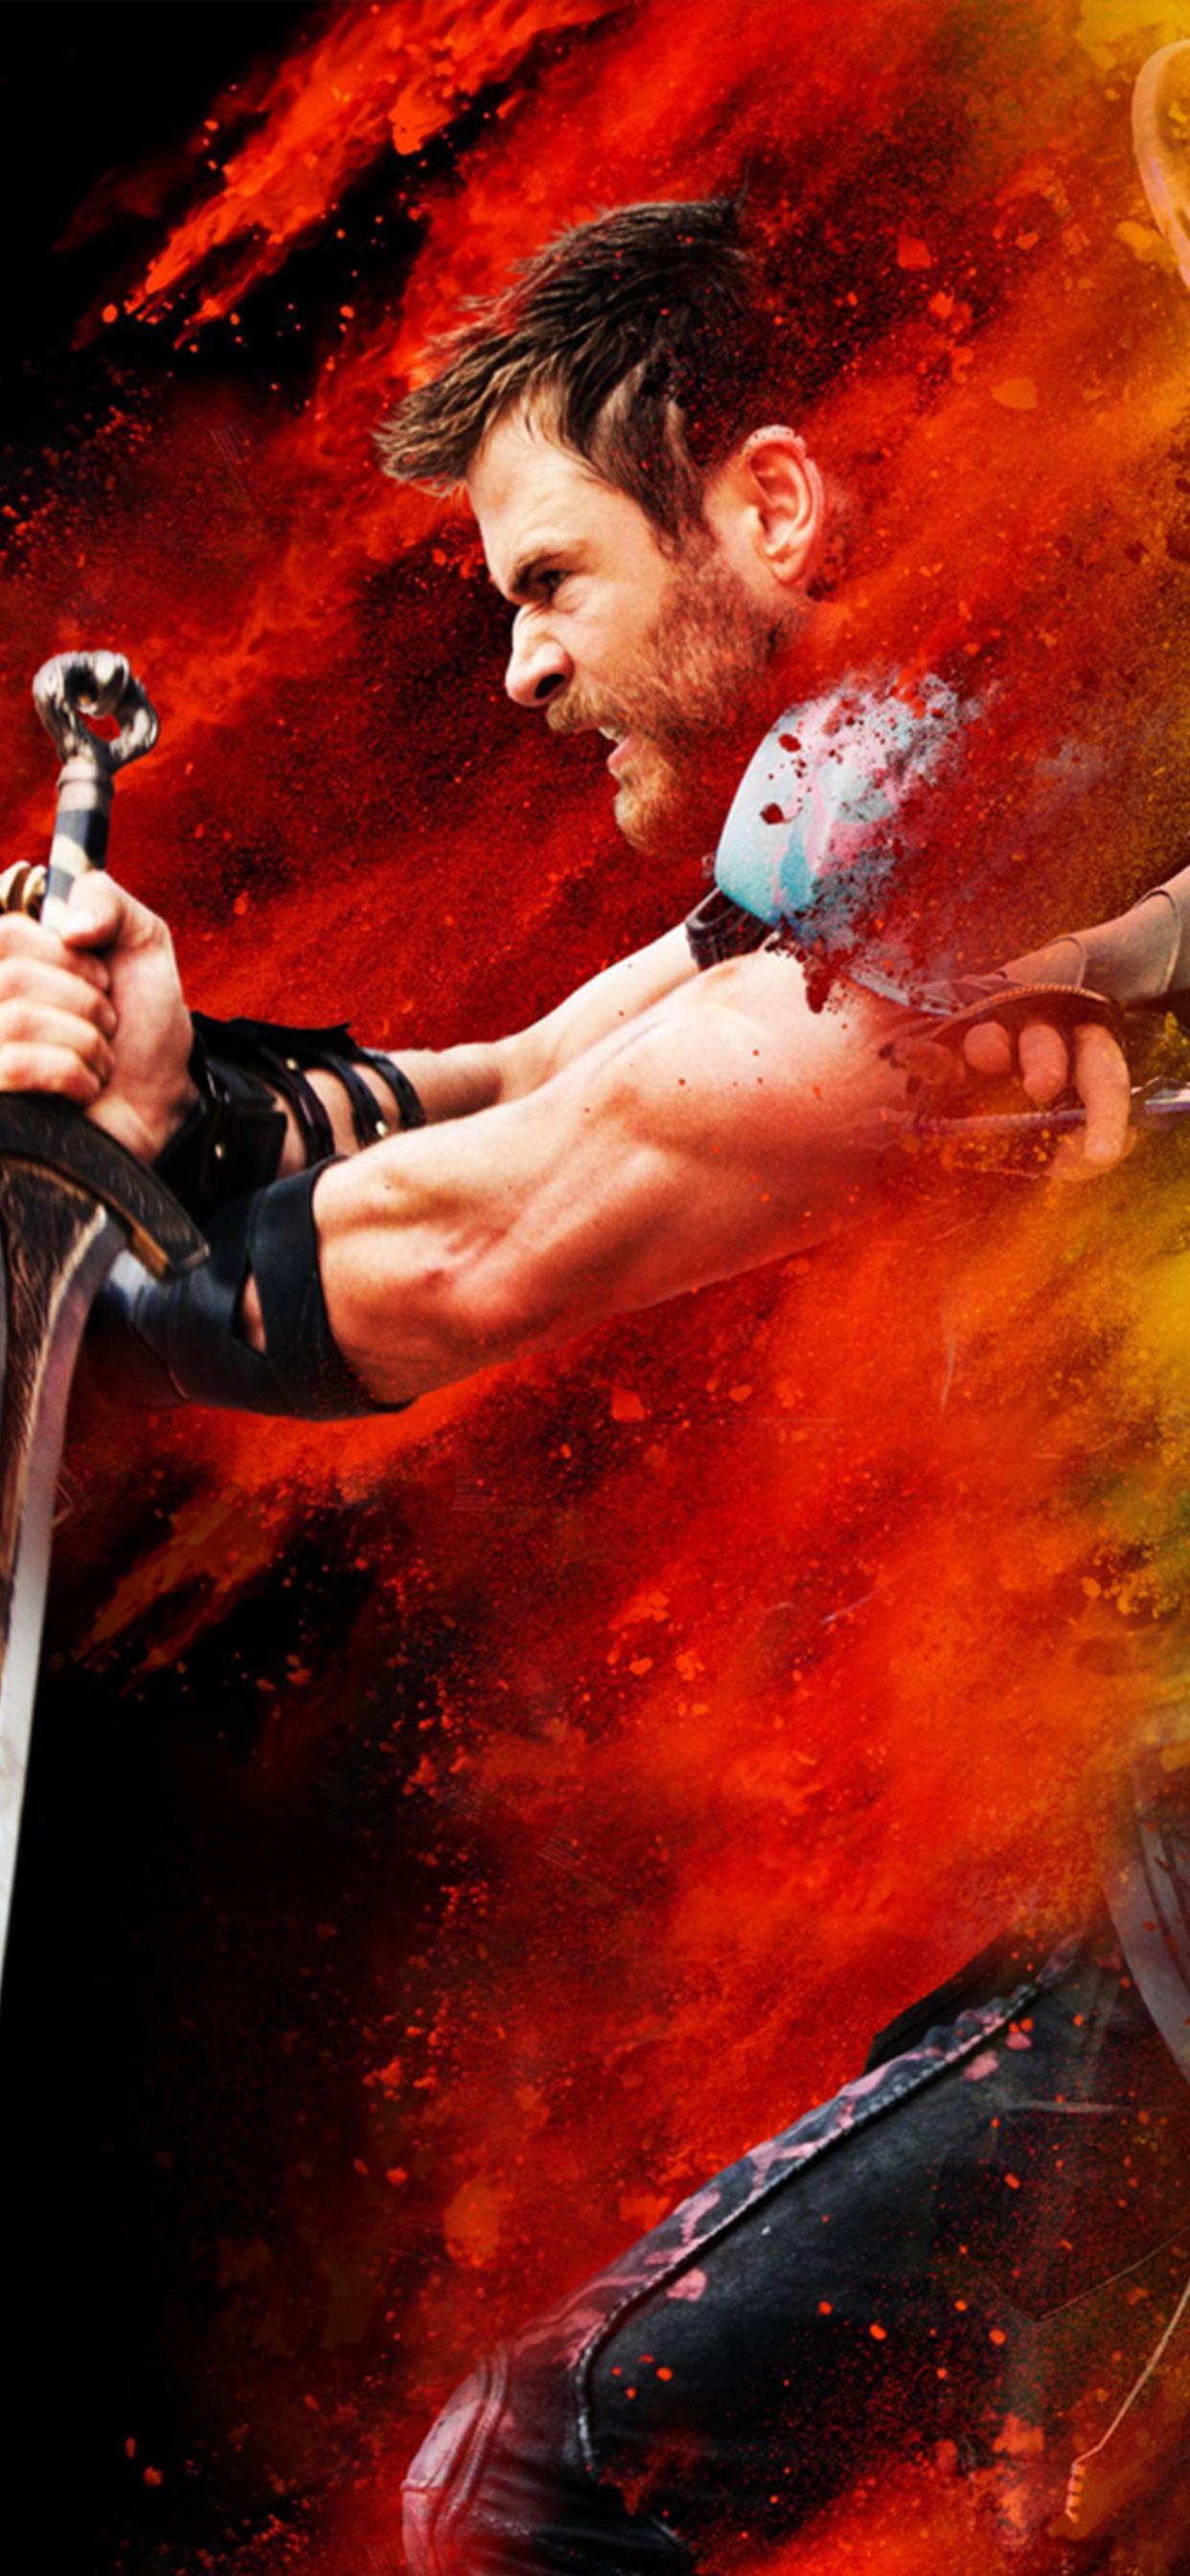 1242x2688 Thor Loki Hulk Thor Ragnarok Iphone Xs Max Hd 4k